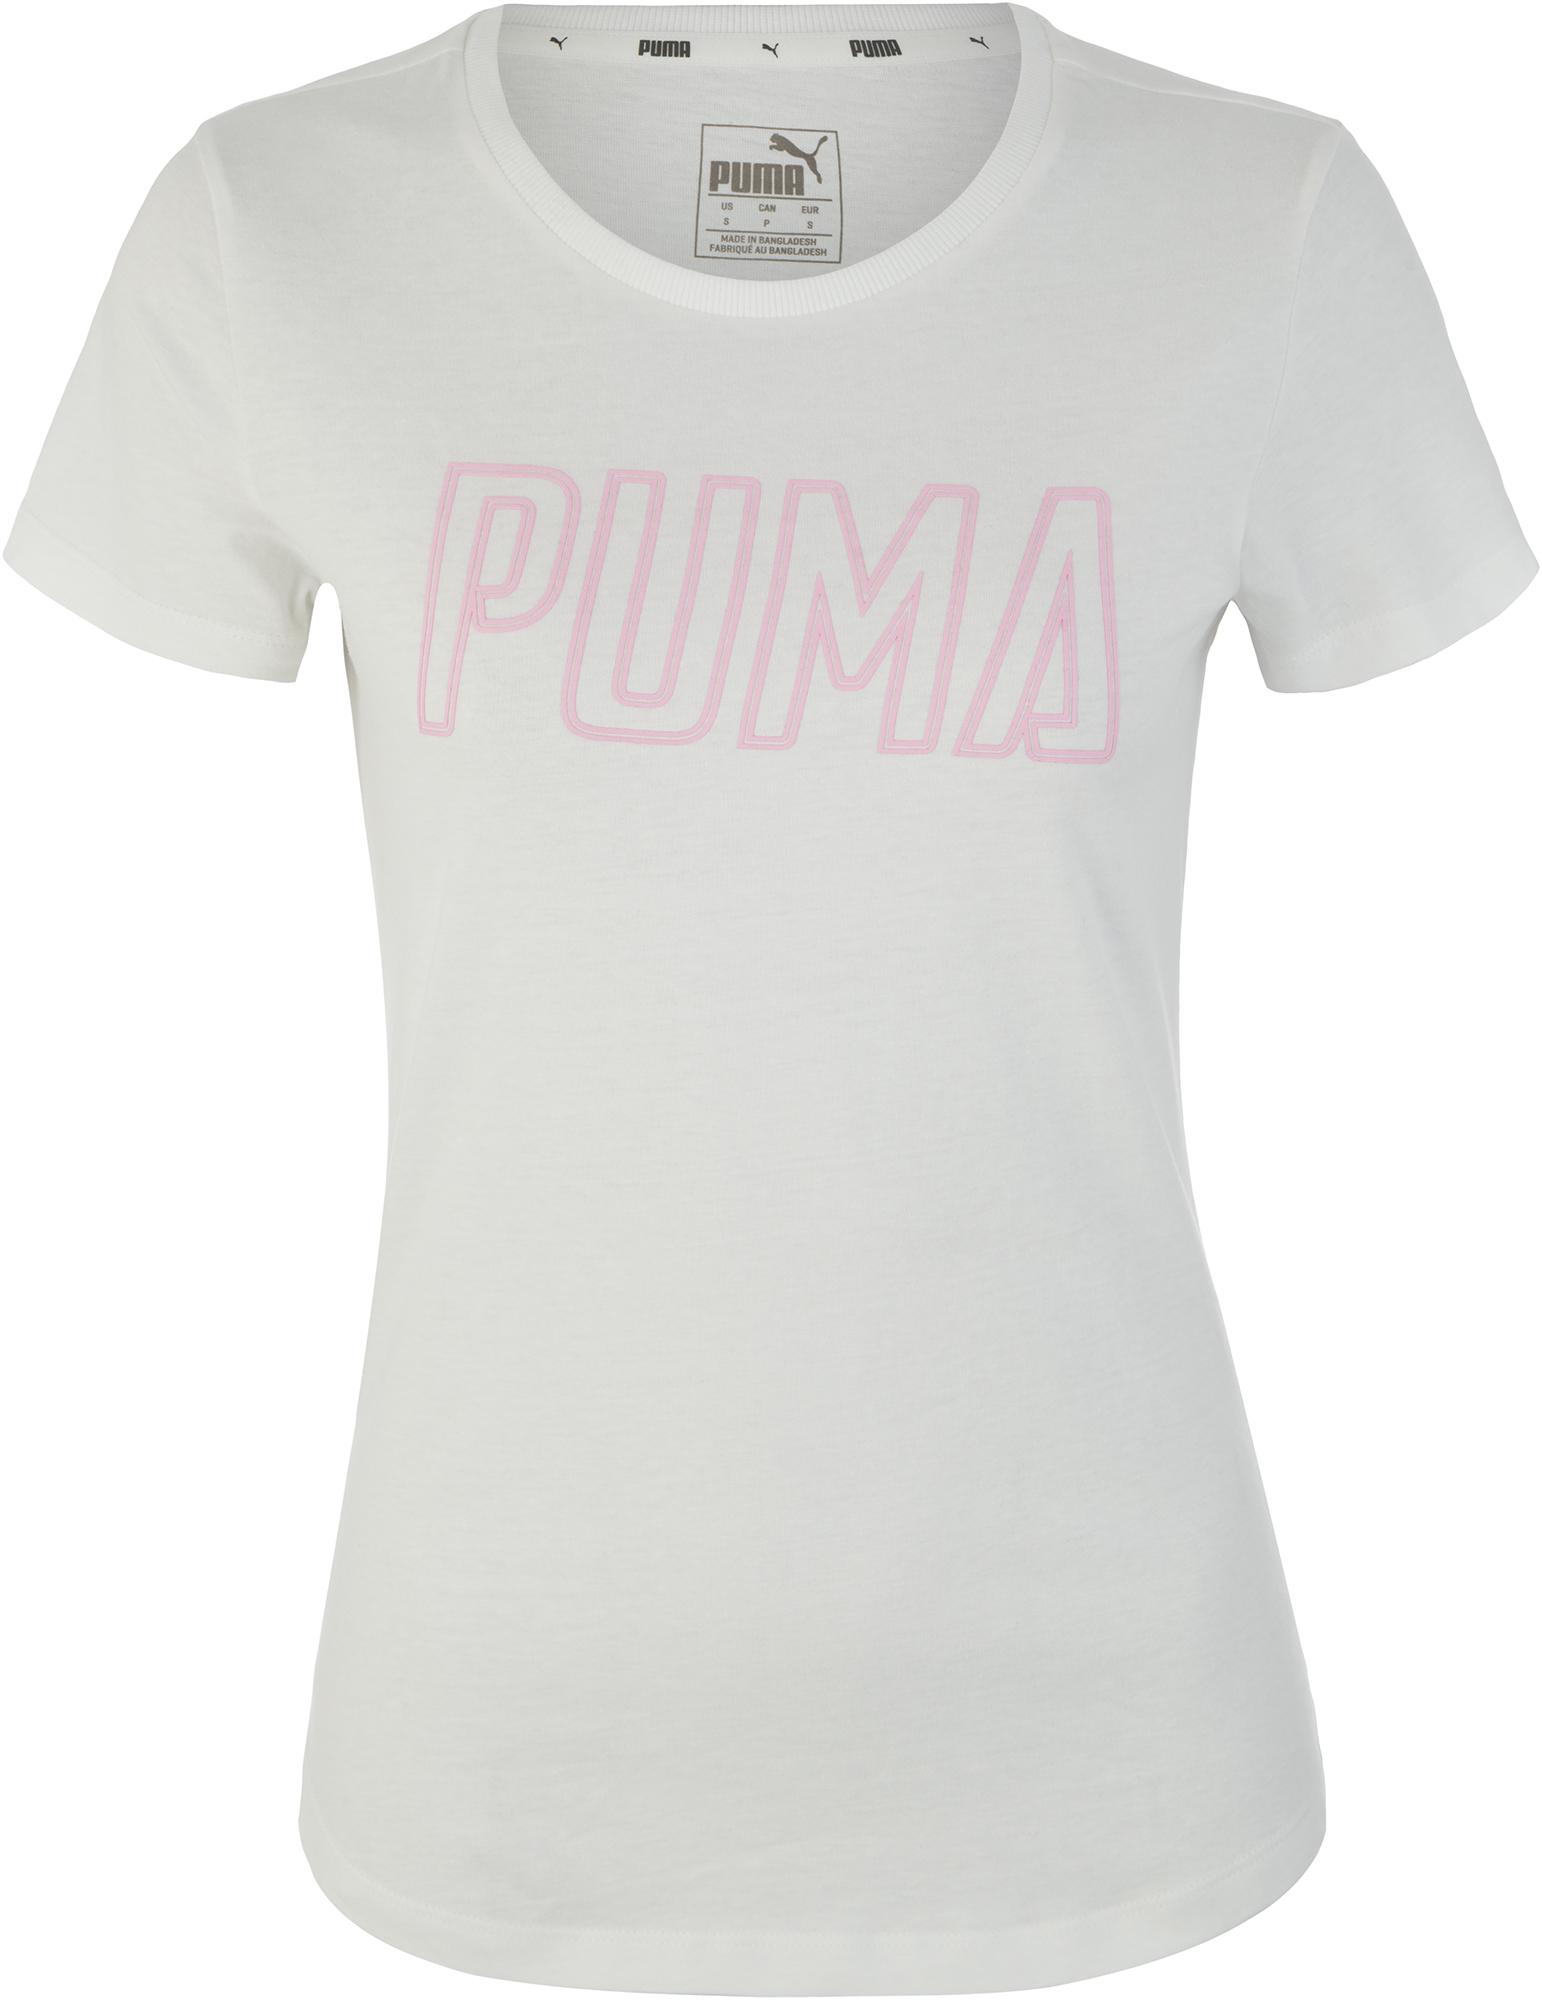 Puma Футболка женская Puma Athletics, размер 46-48